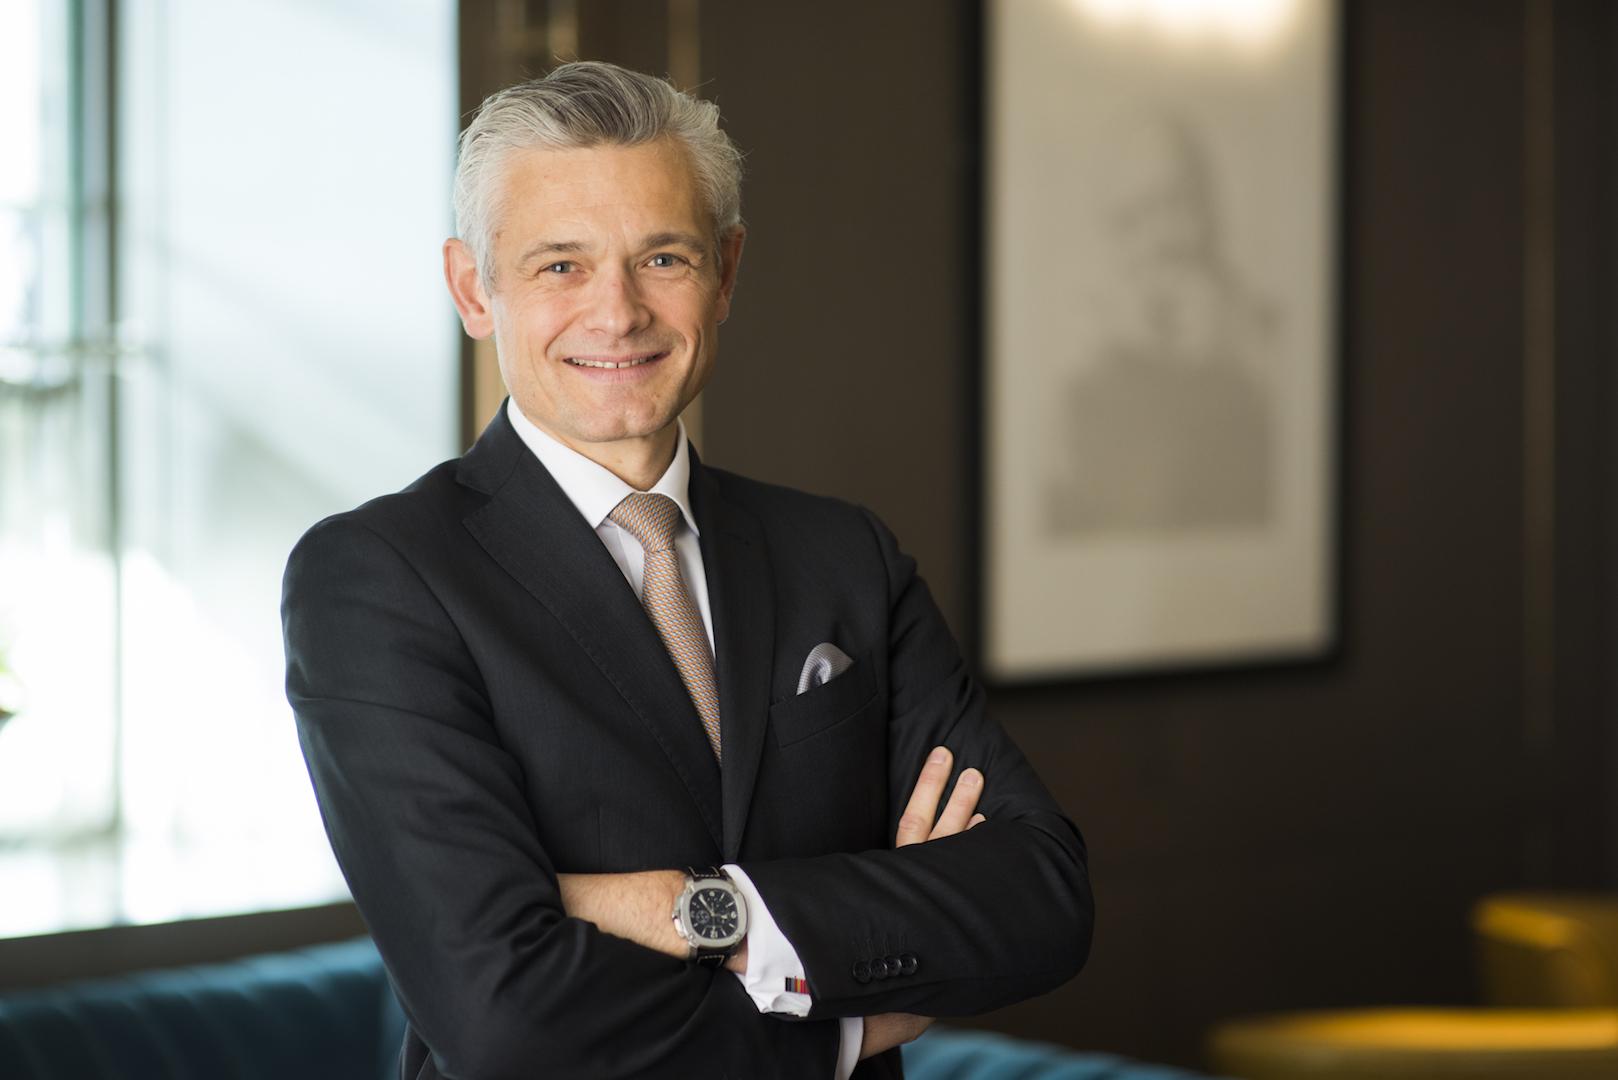 Arnaud de Saint-Exupery, Area Vice President U.K. & Ireland at Hyatt